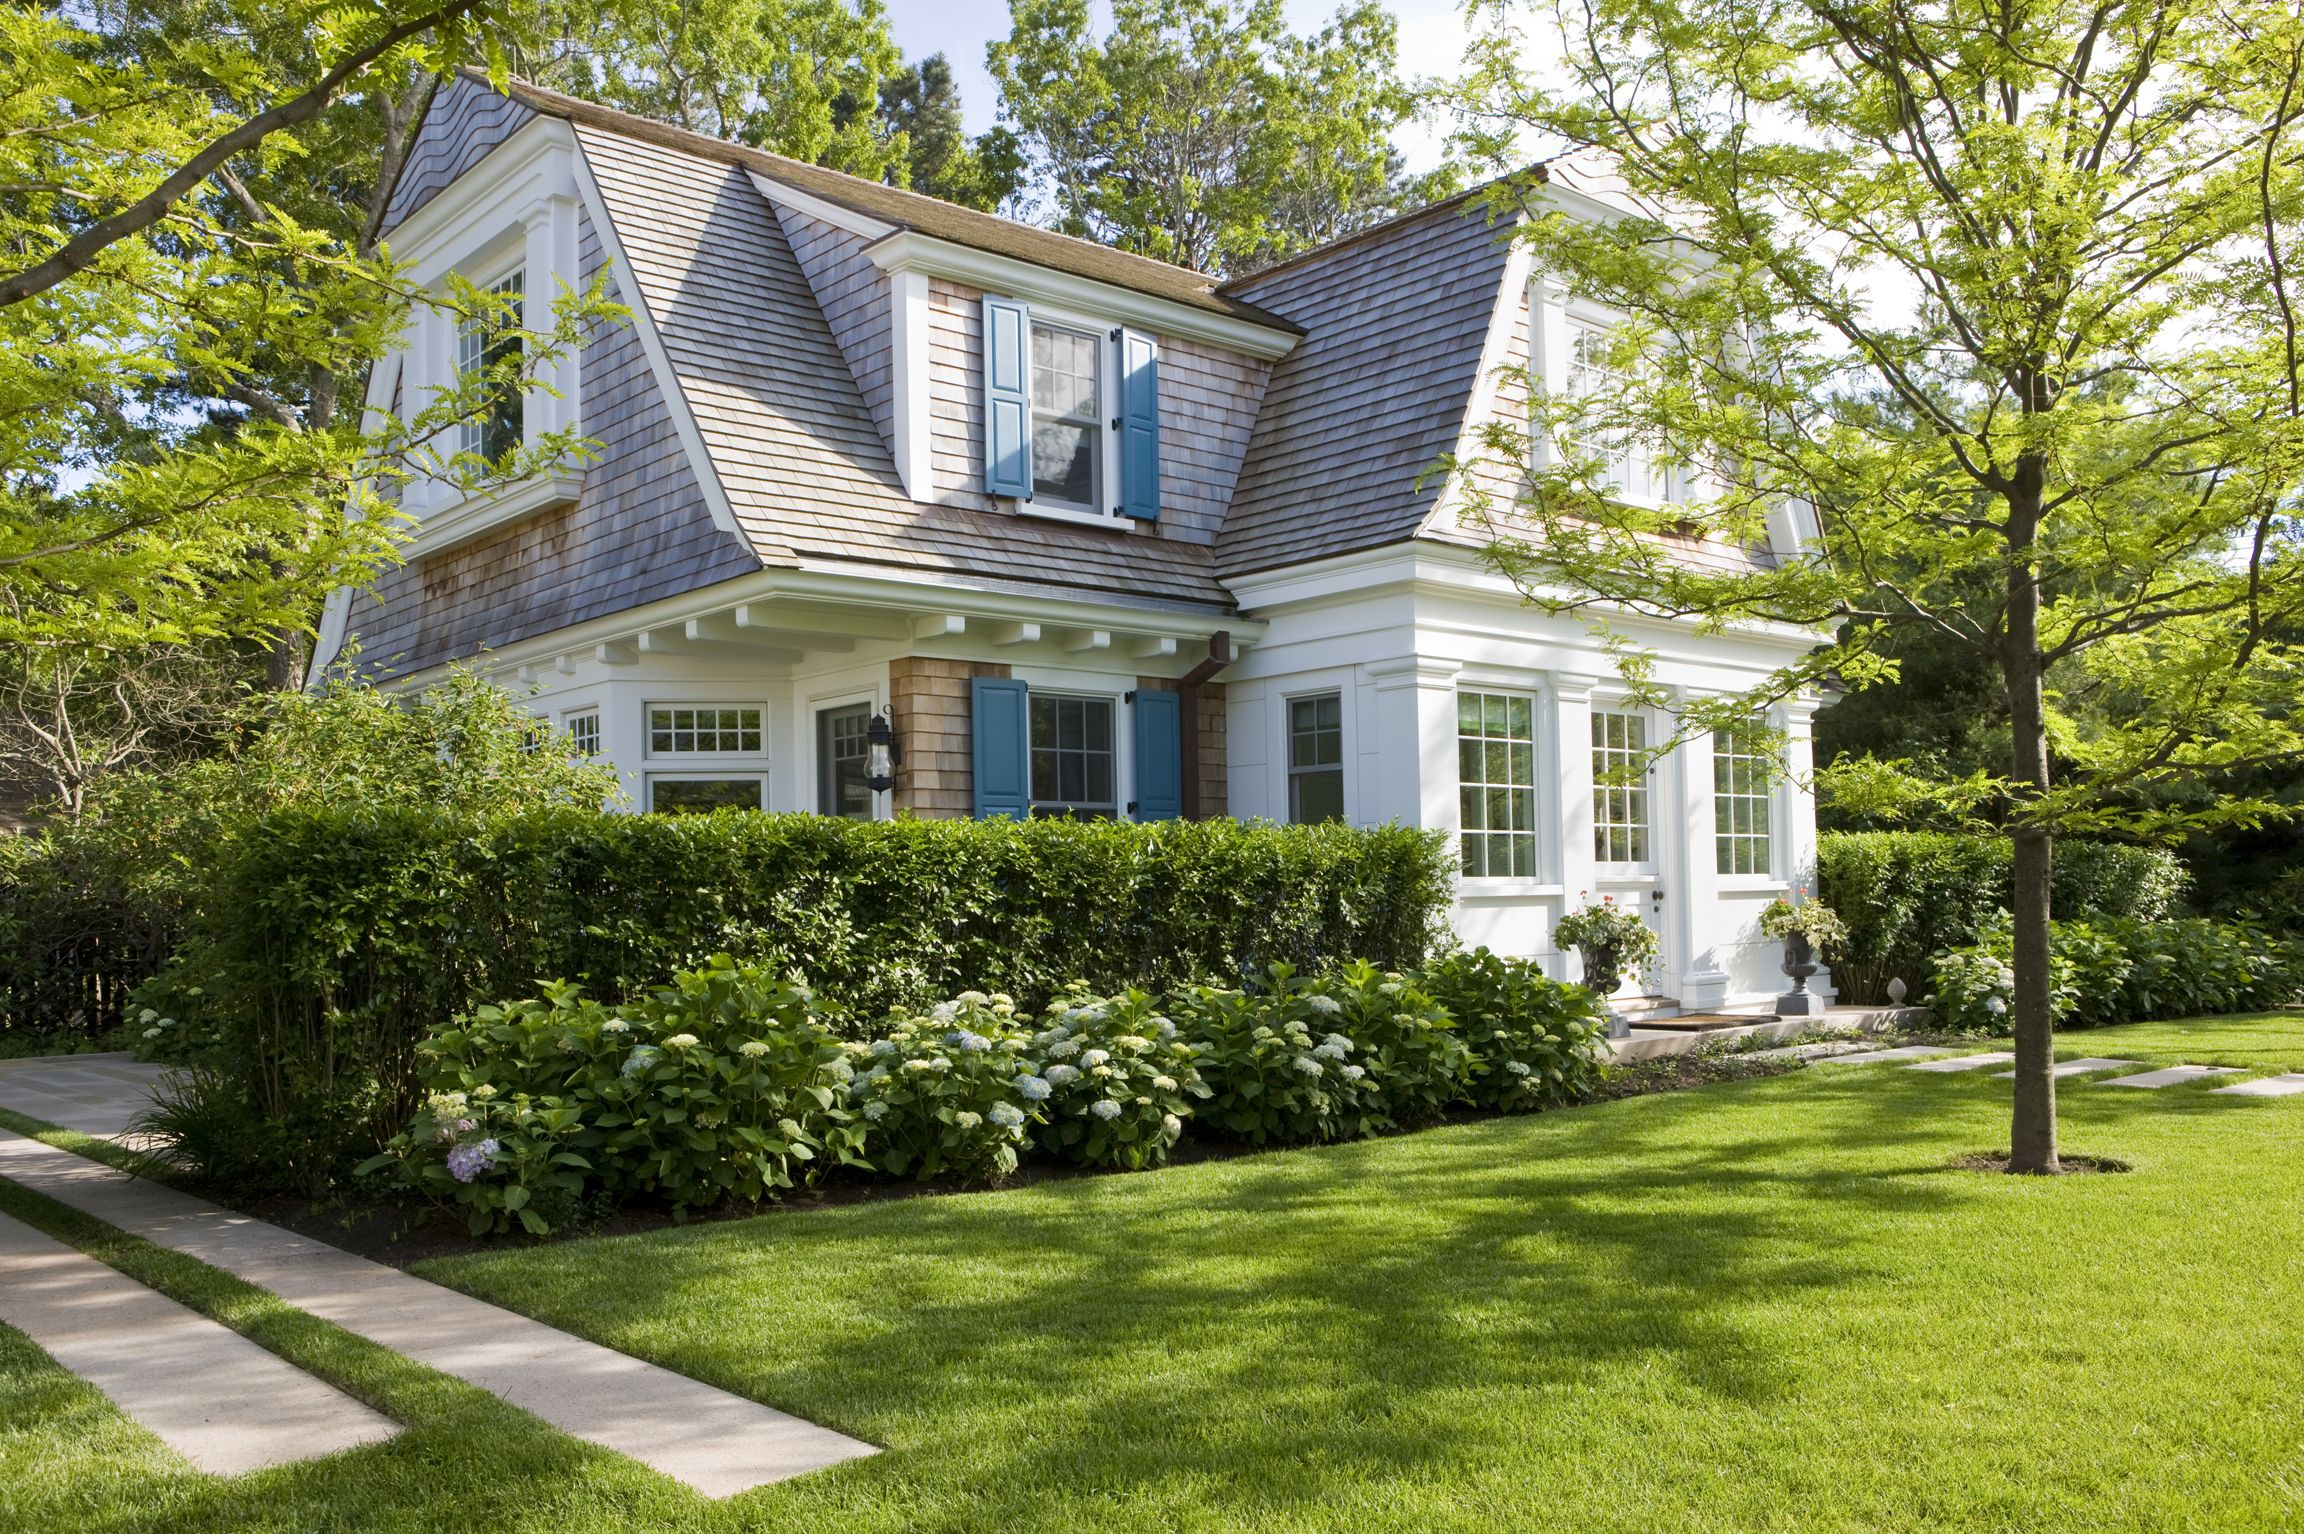 Charming Guest House - Catalano Architects Inc. - Photo: Gordon Beall